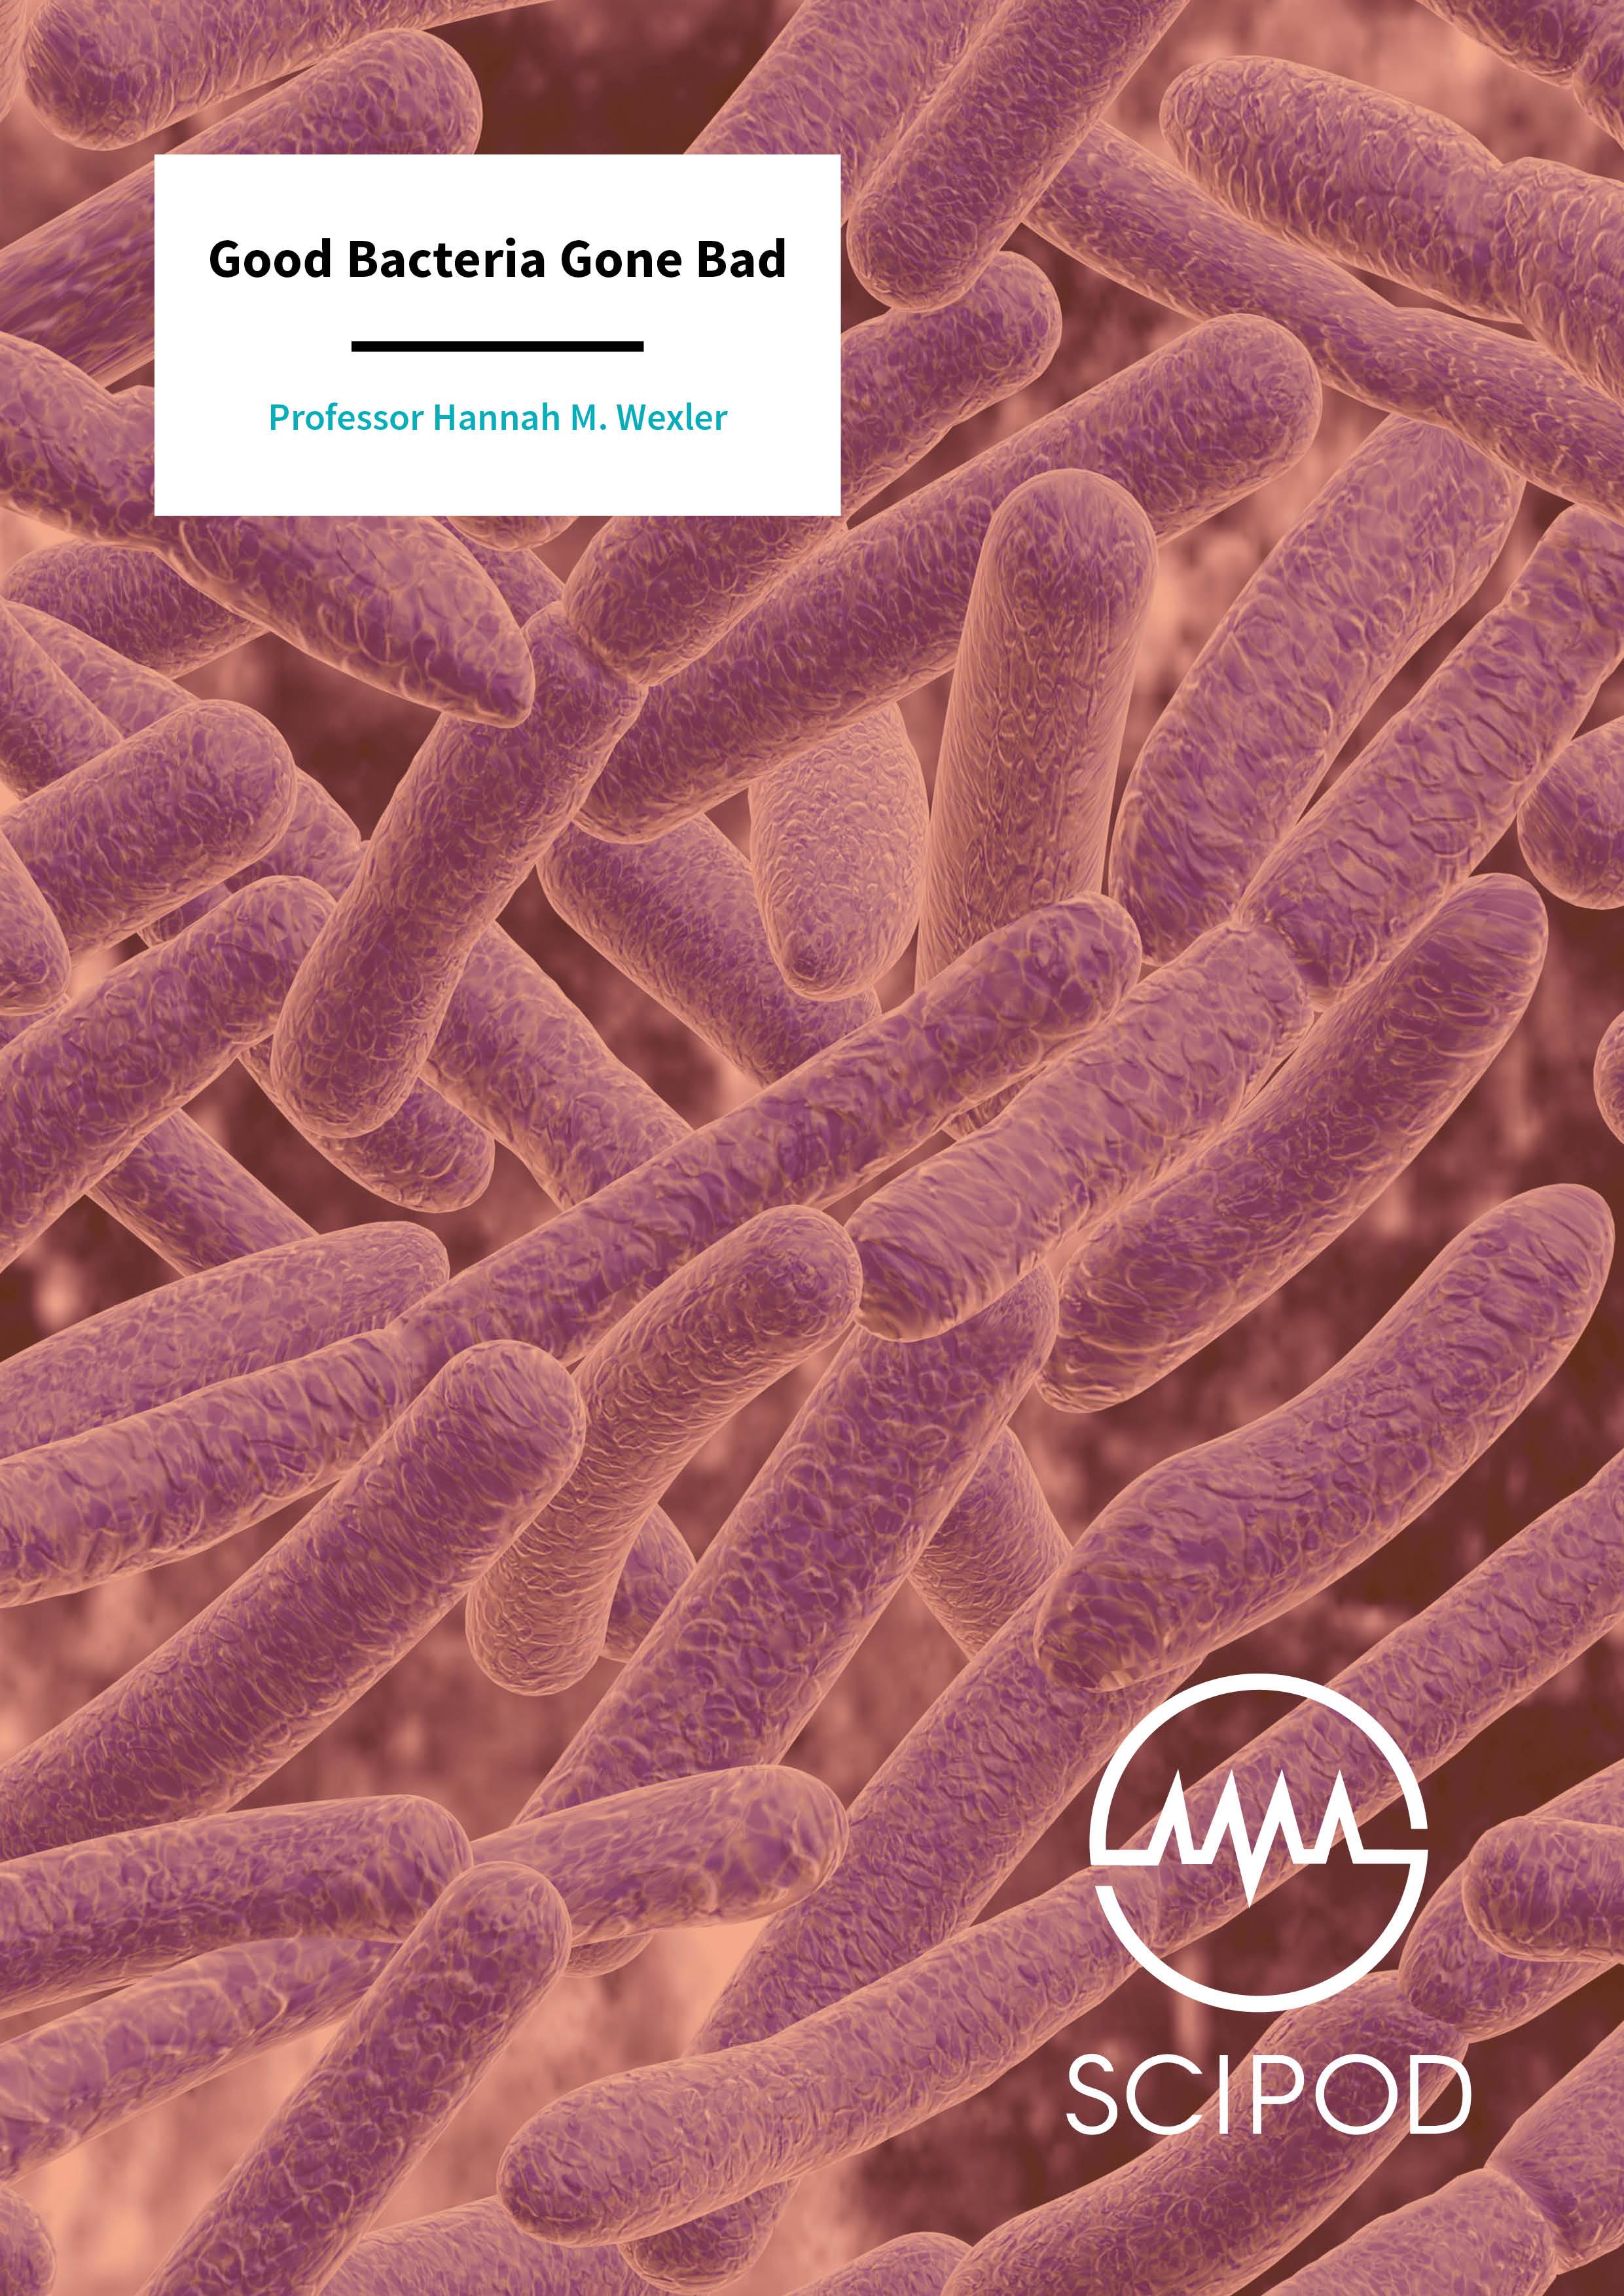 Good Bacteria Gone Bad – Professor Hannah M. Wexler, VA Health Care System